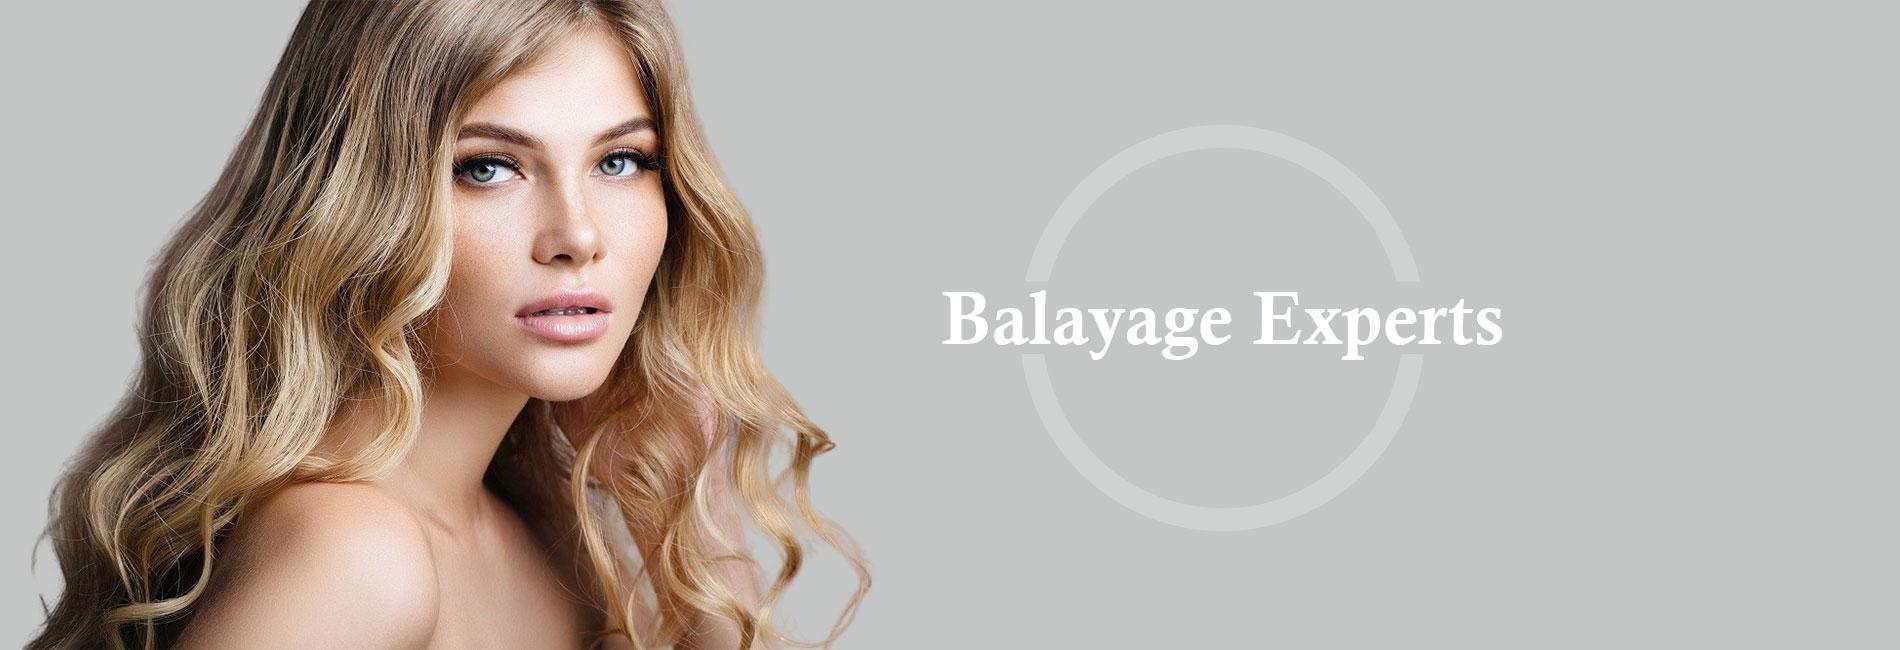 balayage My Hair Guru, Hair Colour, Top Hair Salon in Paisley